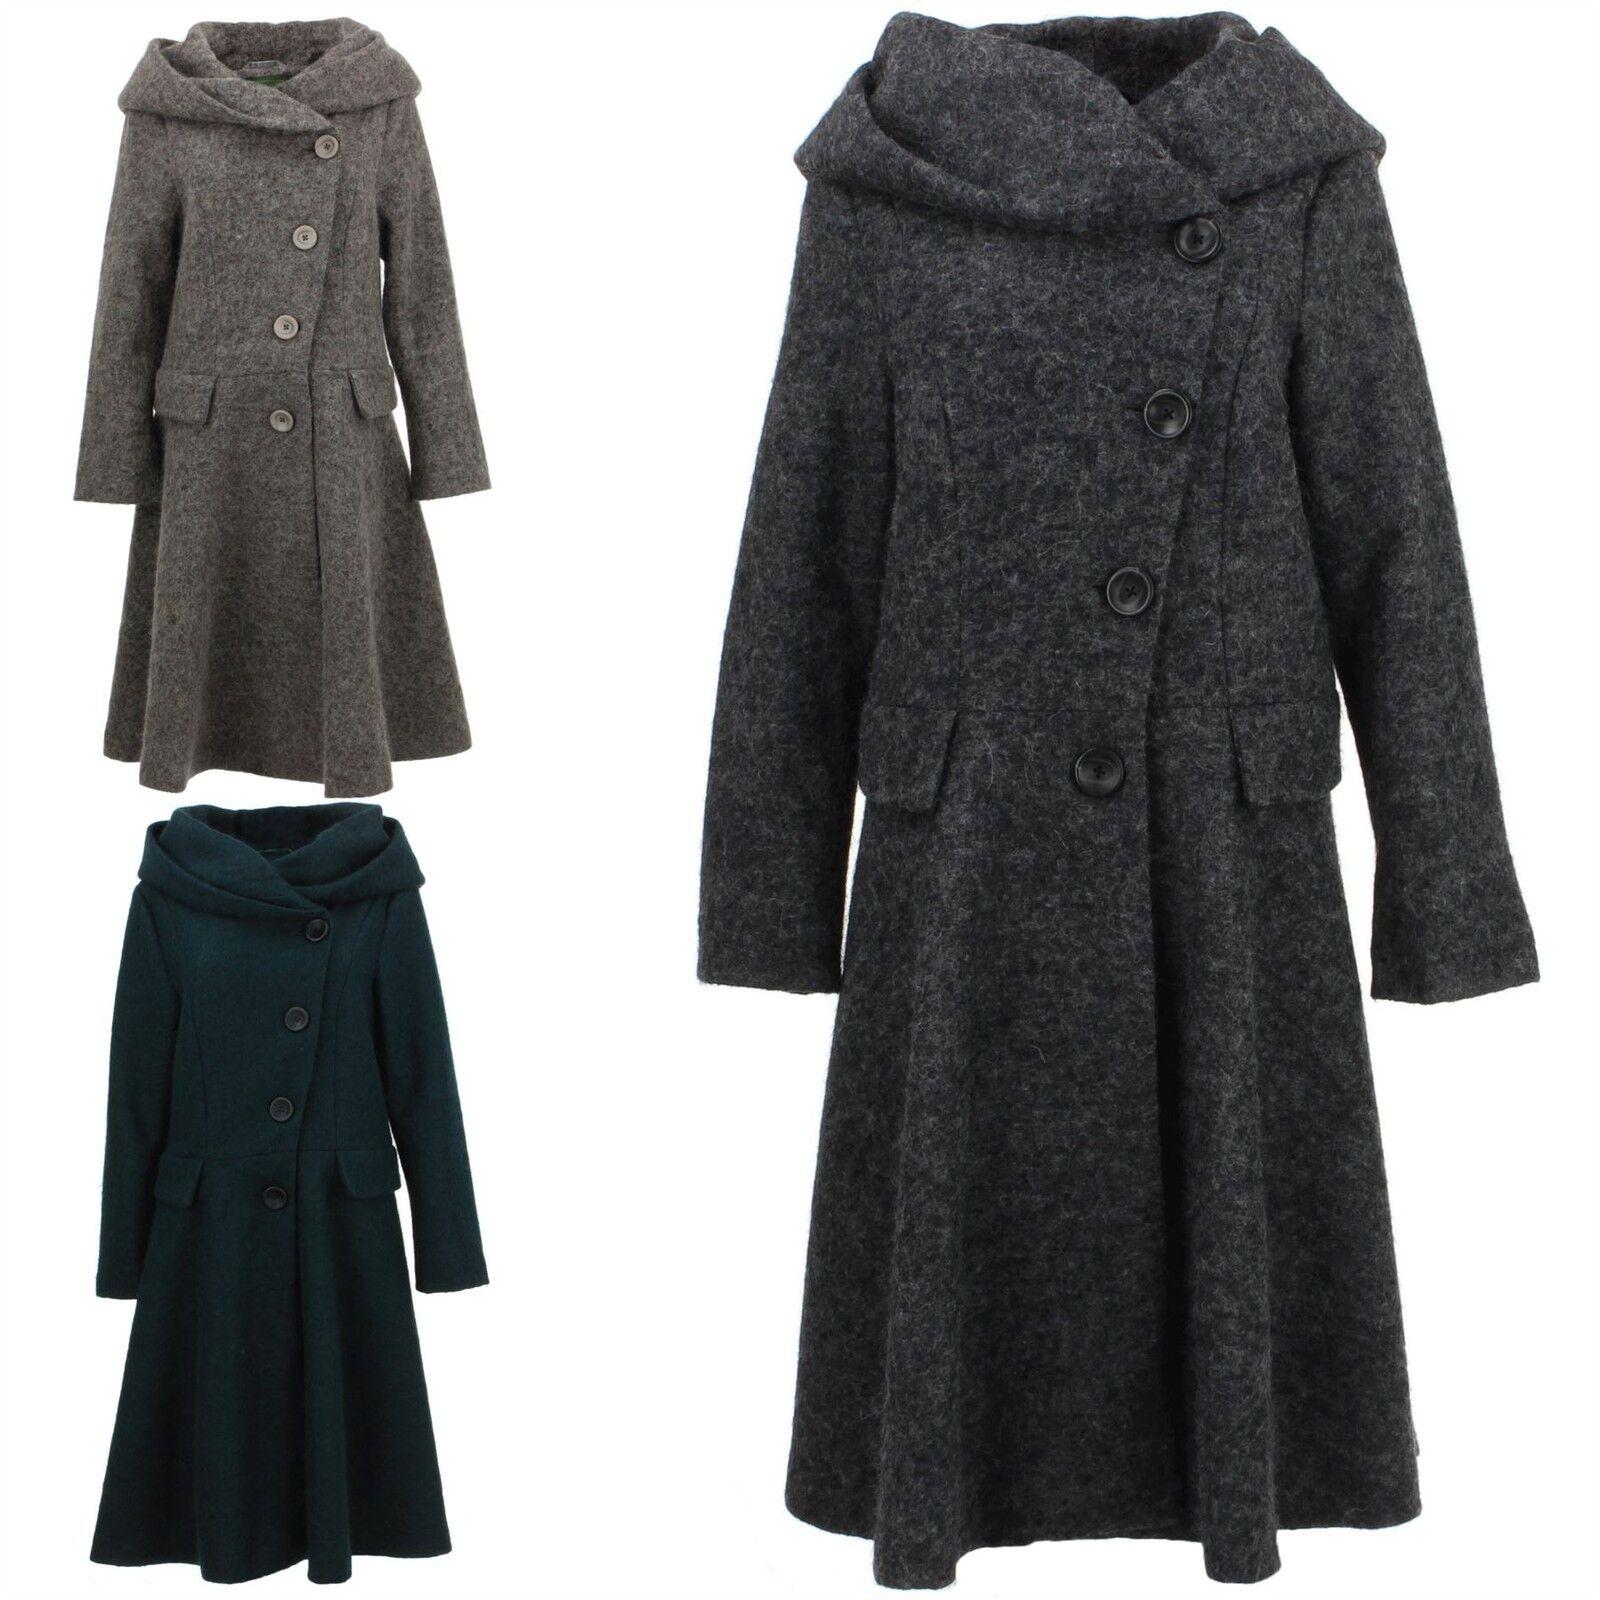 Ladies Wool Winter Coat Jacket BOHEMIA SWEDEN Woven Wool-rich blend Hood